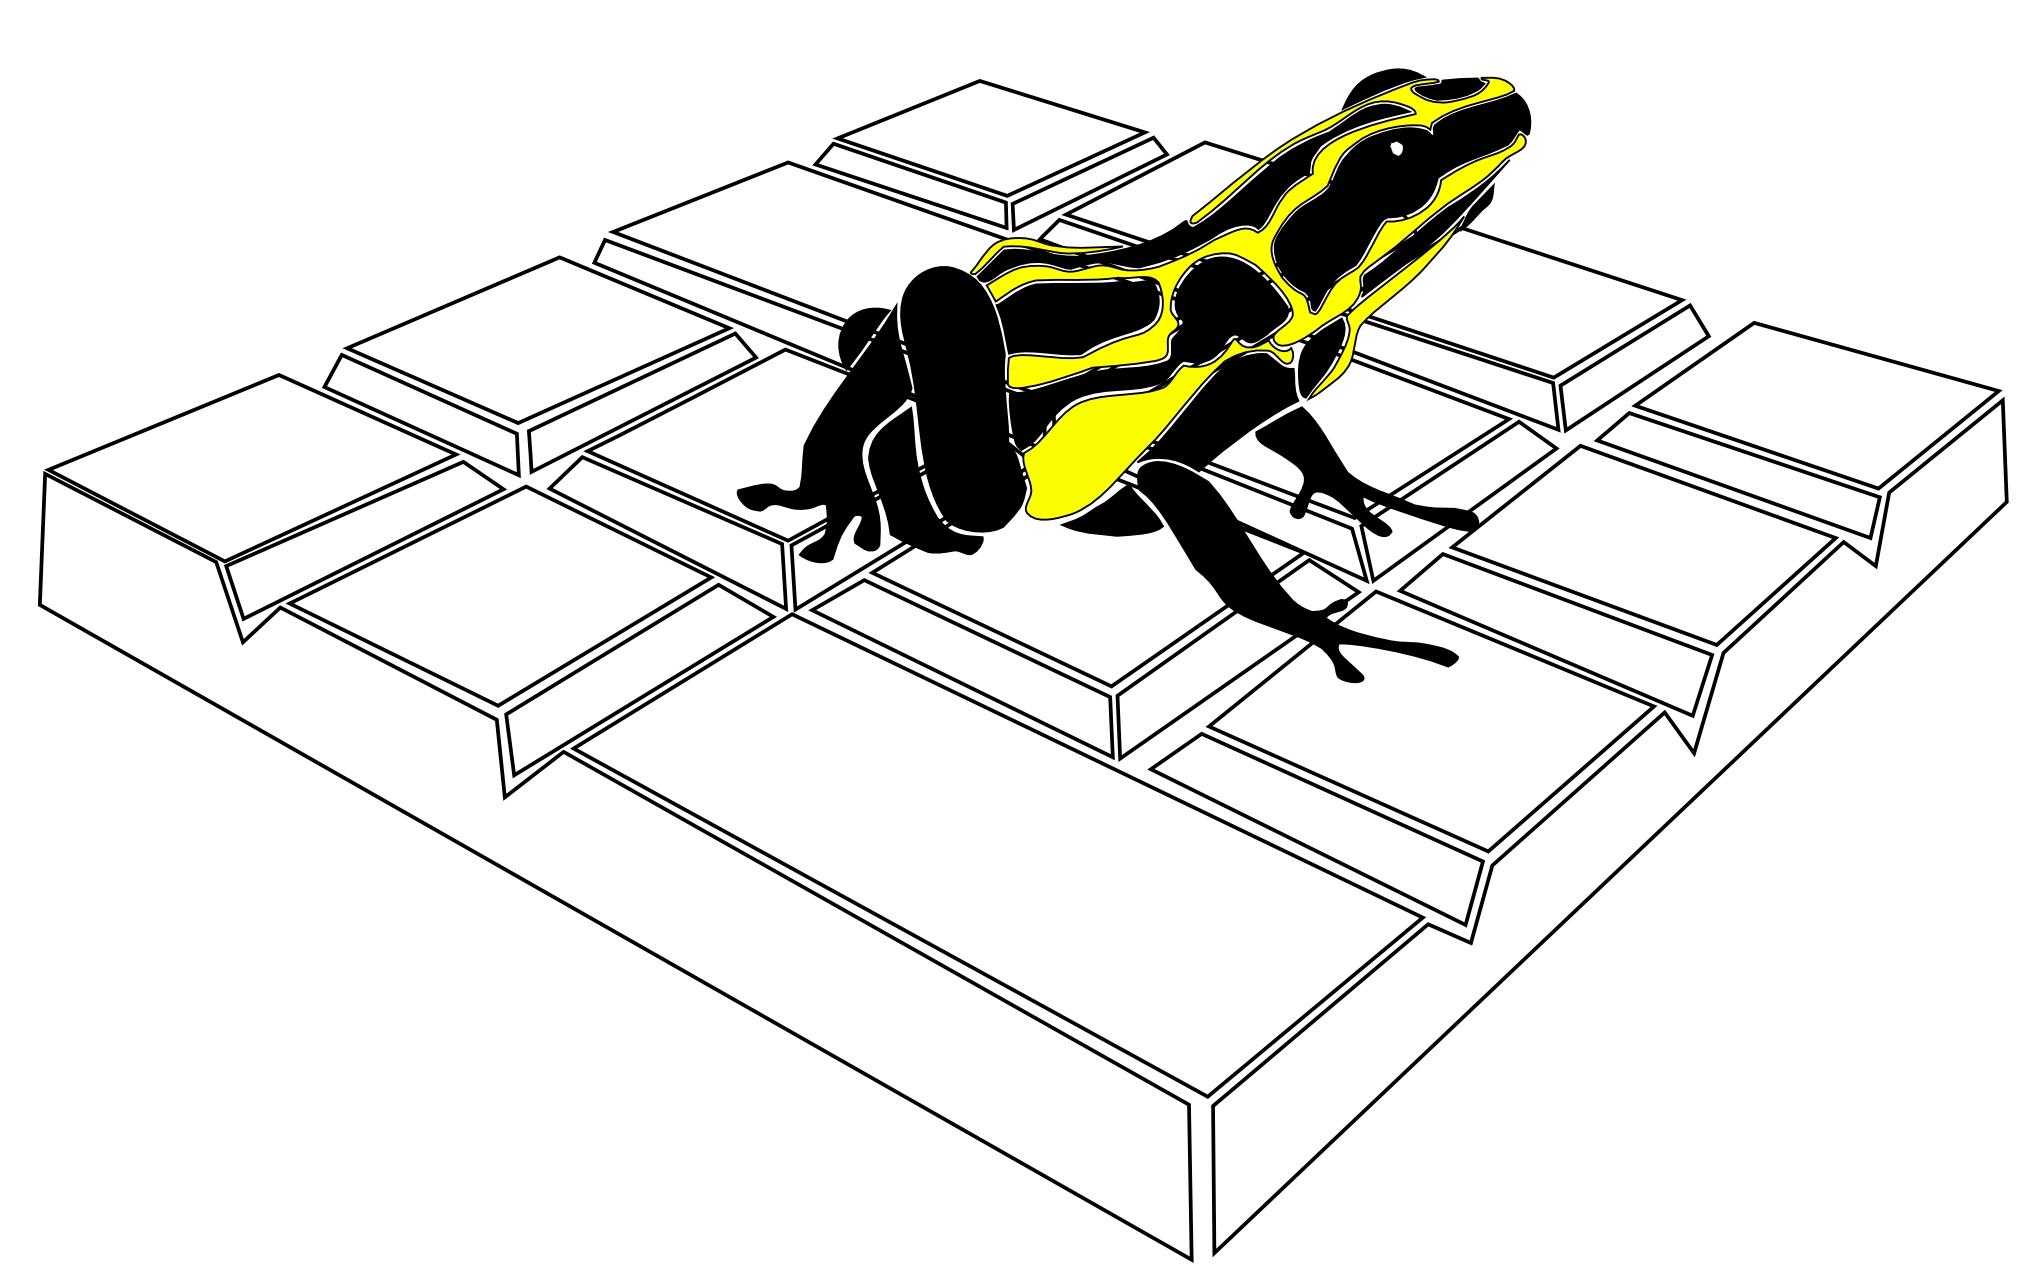 Frog-bw-half